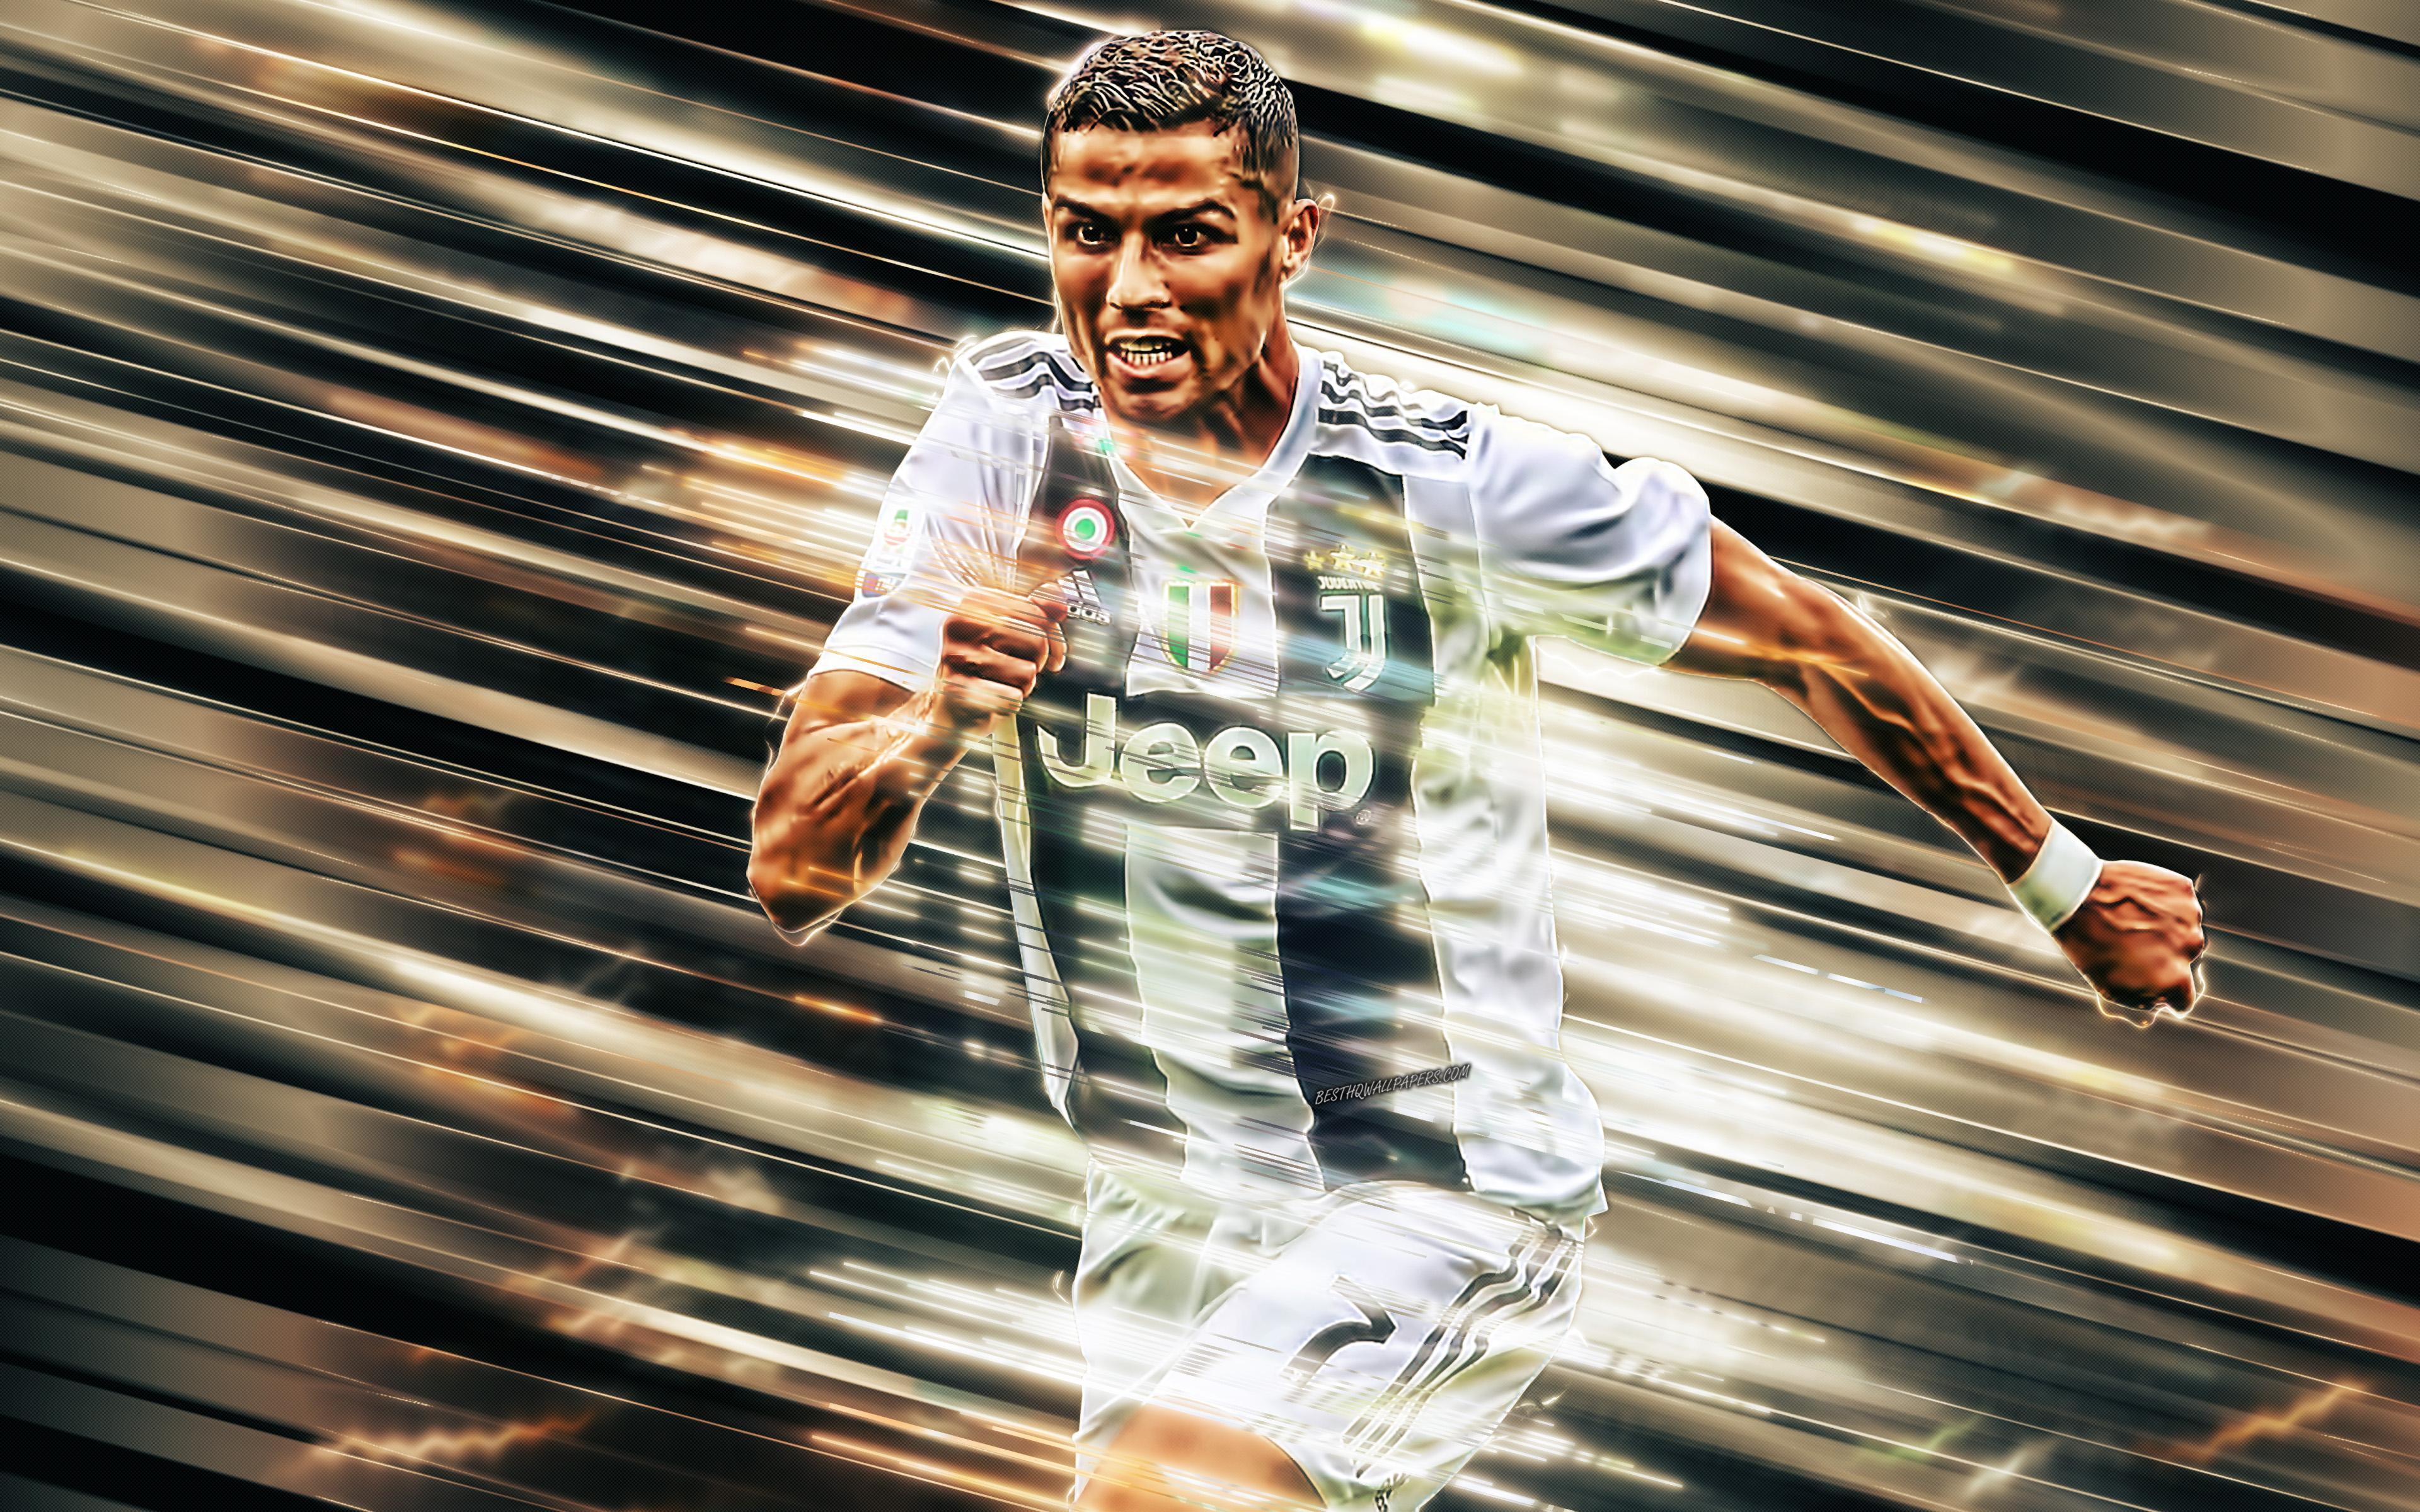 Cristiano Ronaldo Juve 4k Ultra Hd Wallpaper Background Image